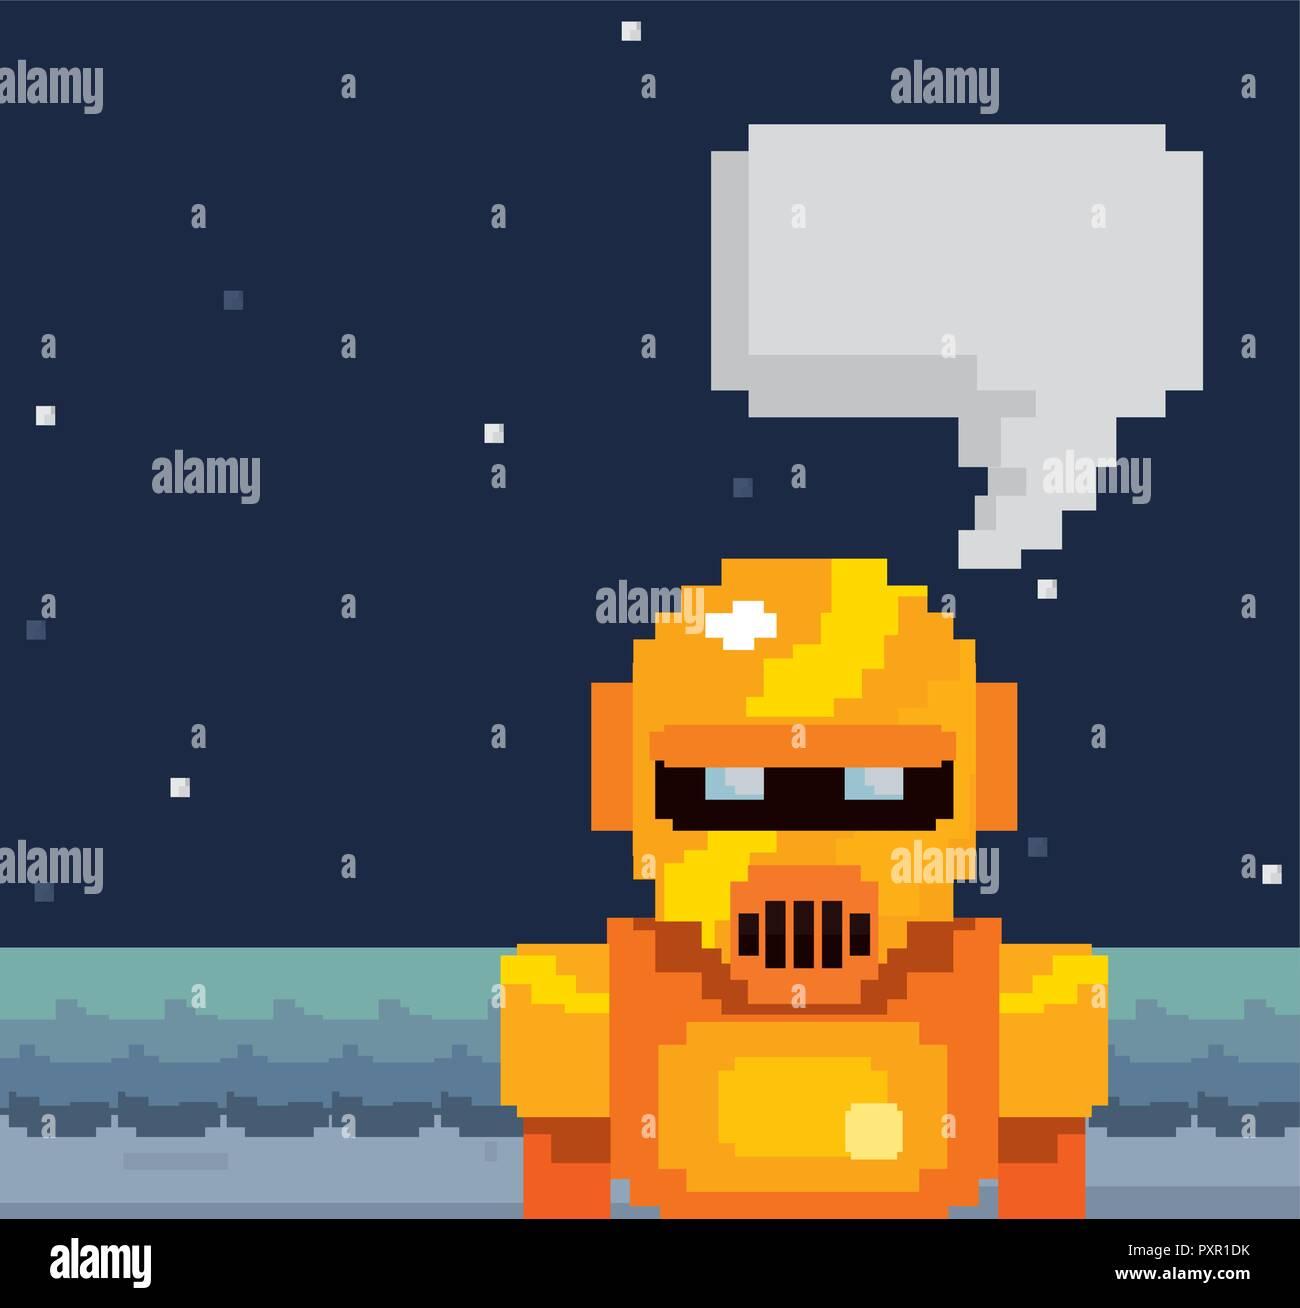 pixel video game robot speech bubble vector illustration  - Stock Image